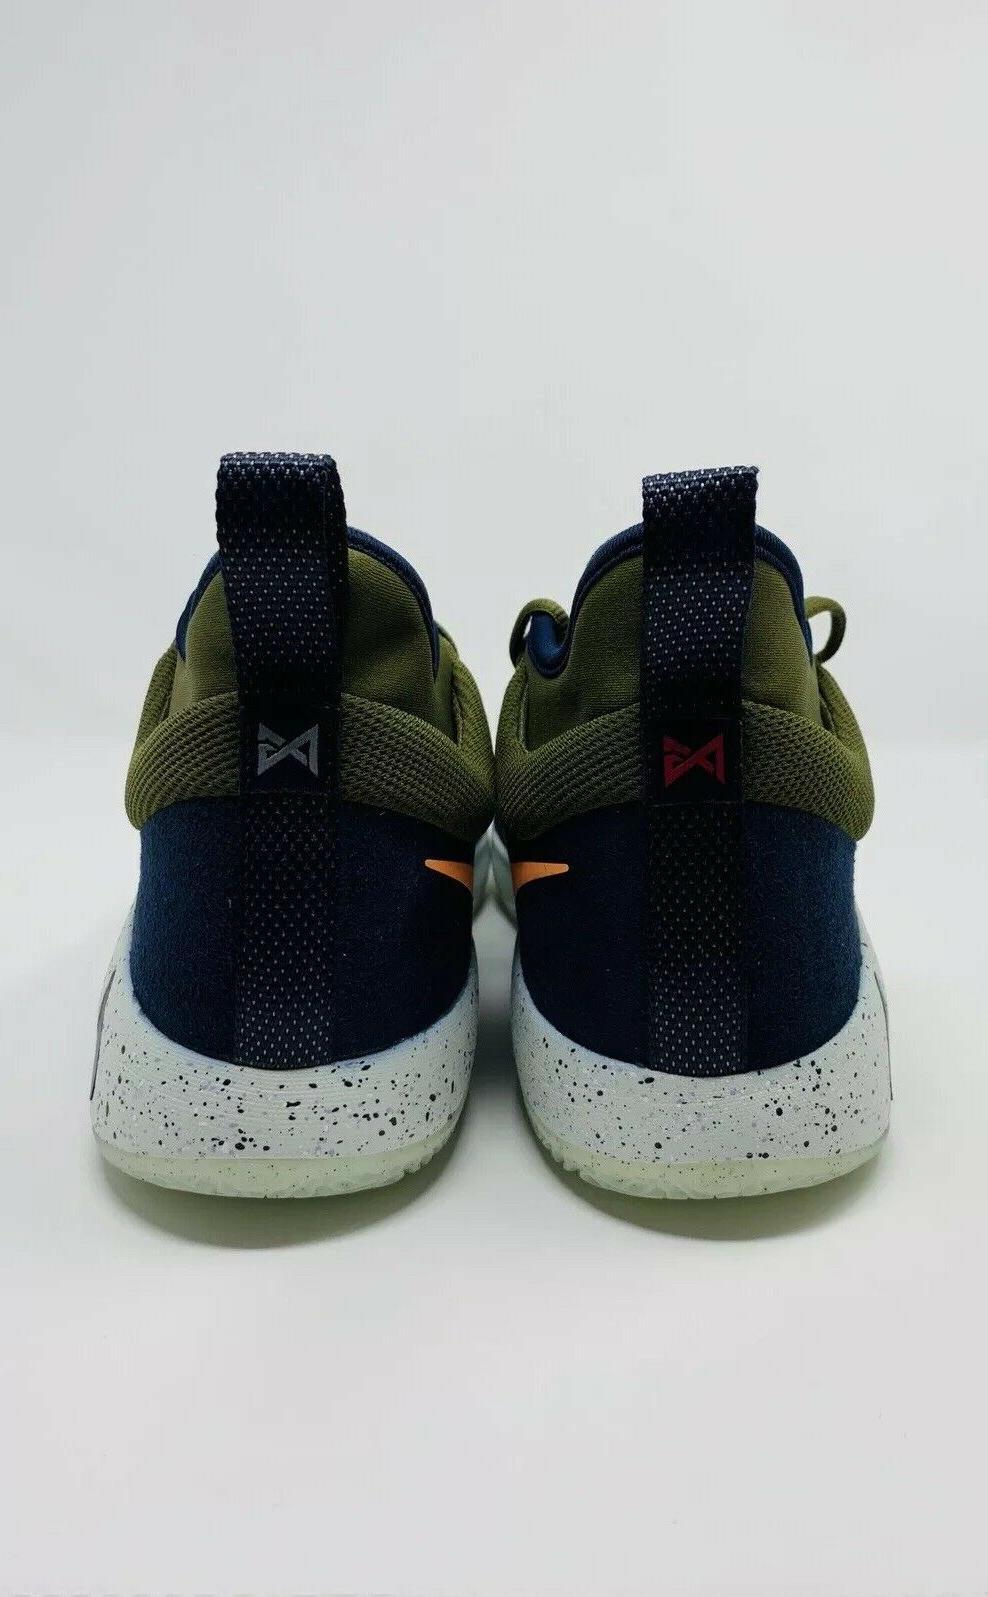 Nike PG Olive Shoes AJ2039-300 11